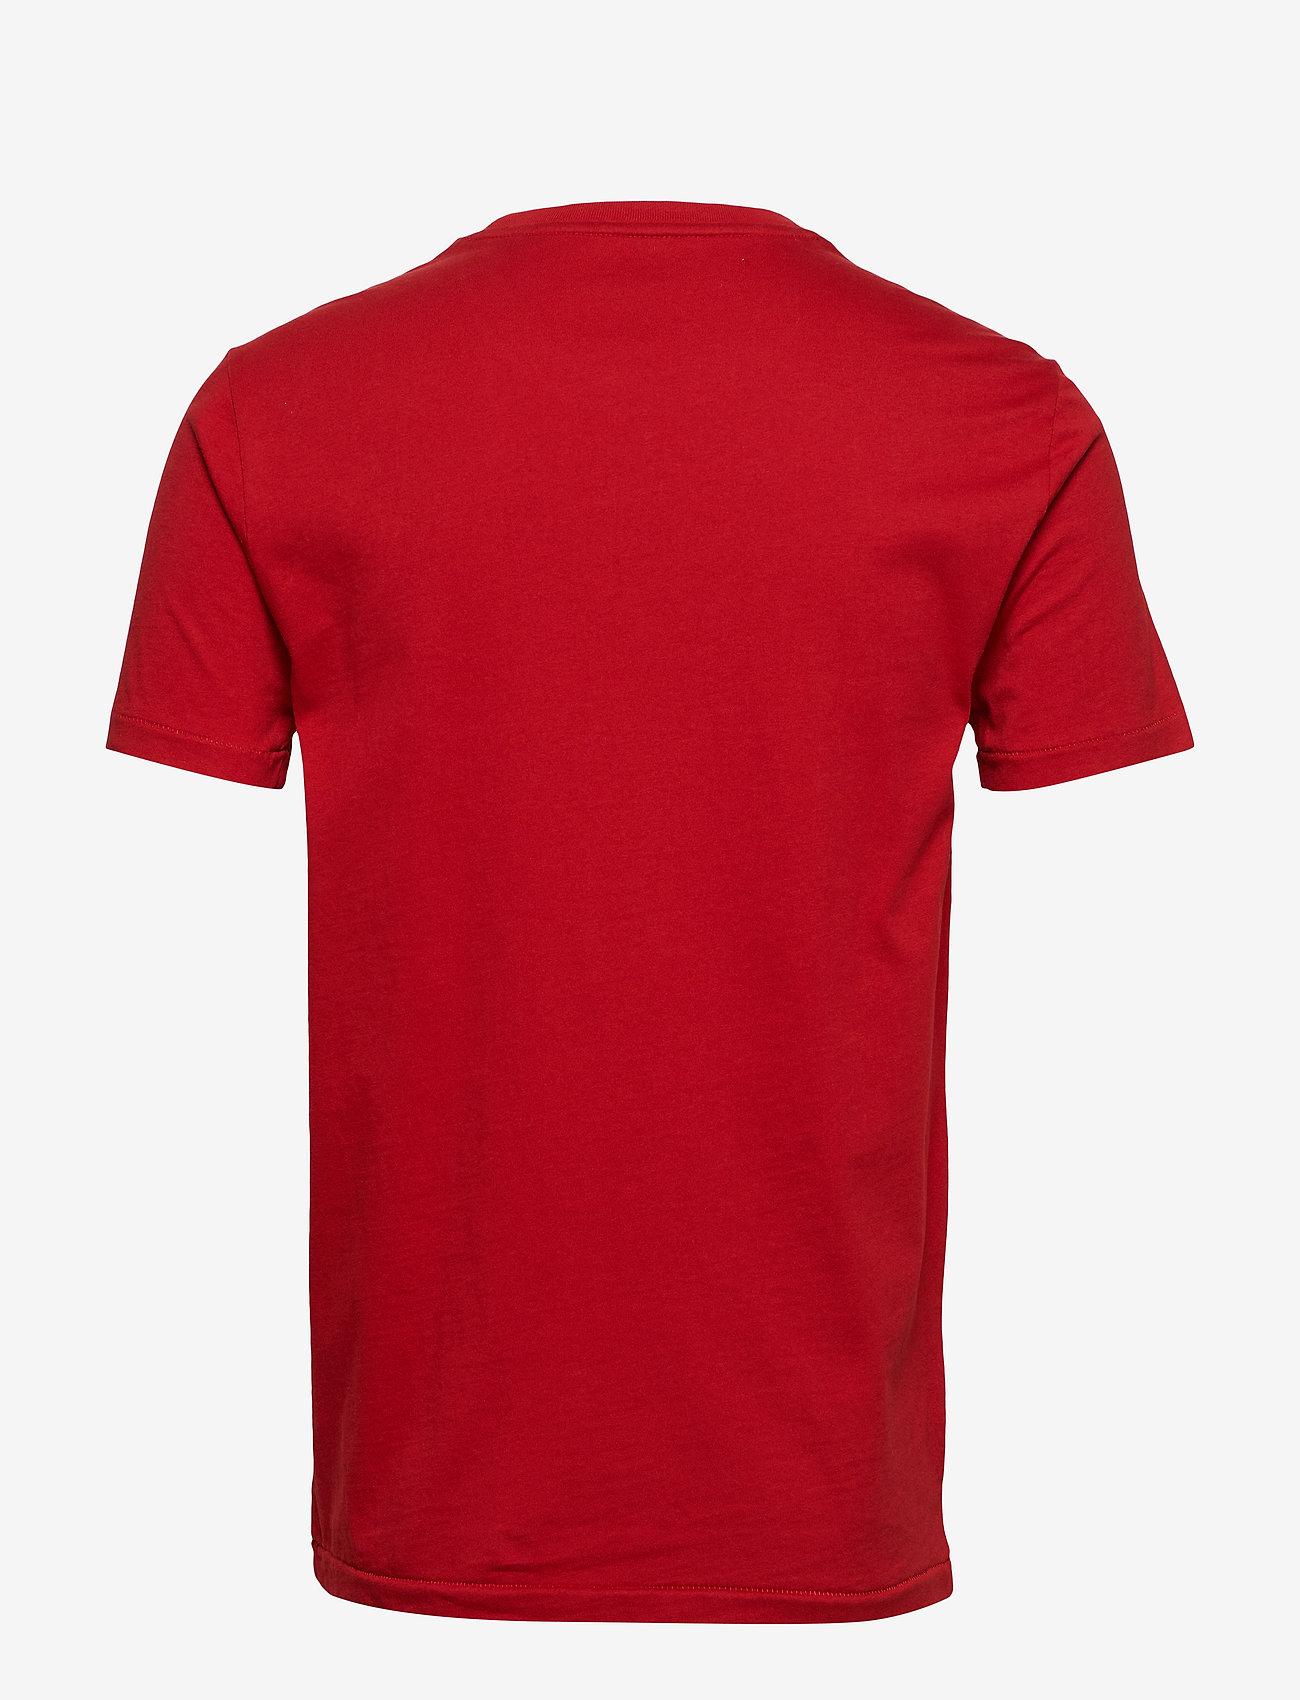 Sscncmslm1-short Sleeve-t-shirt (Pioneer Red) - Polo Ralph Lauren O0mtj3